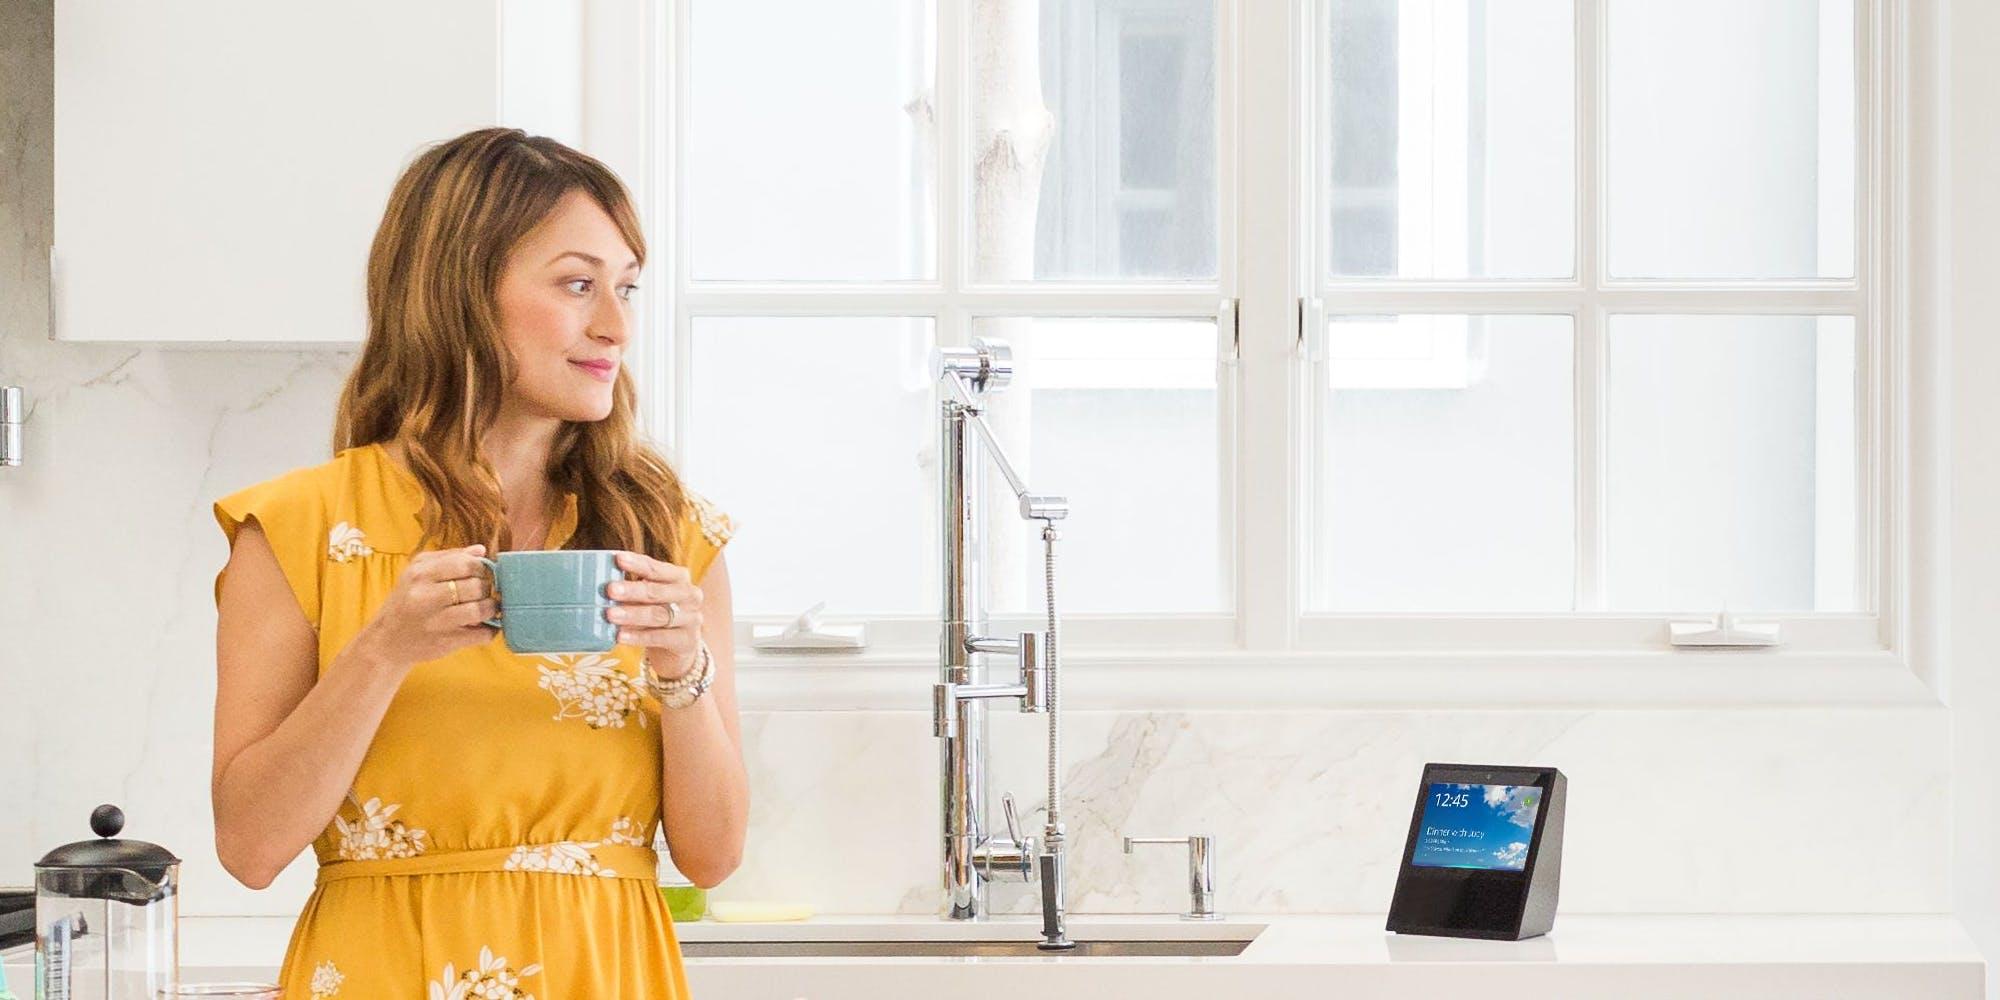 how to use Amazon Alexa: Woman looking towards Amazon Echo Show